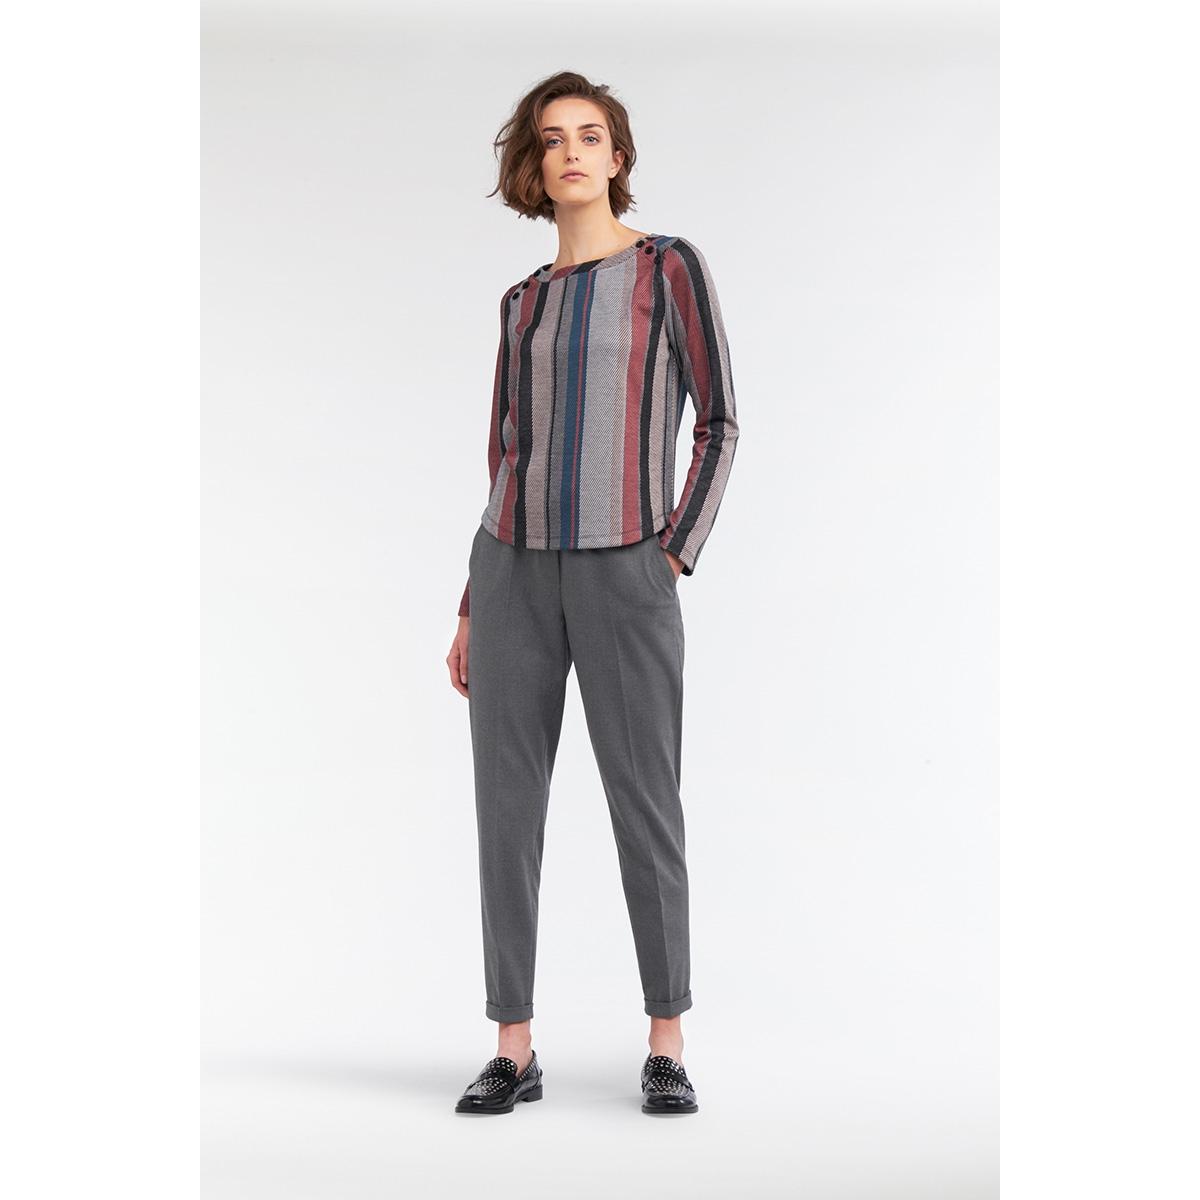 jacquard sweatshirt met strepen 21201572 sandwich t-shirt 20150